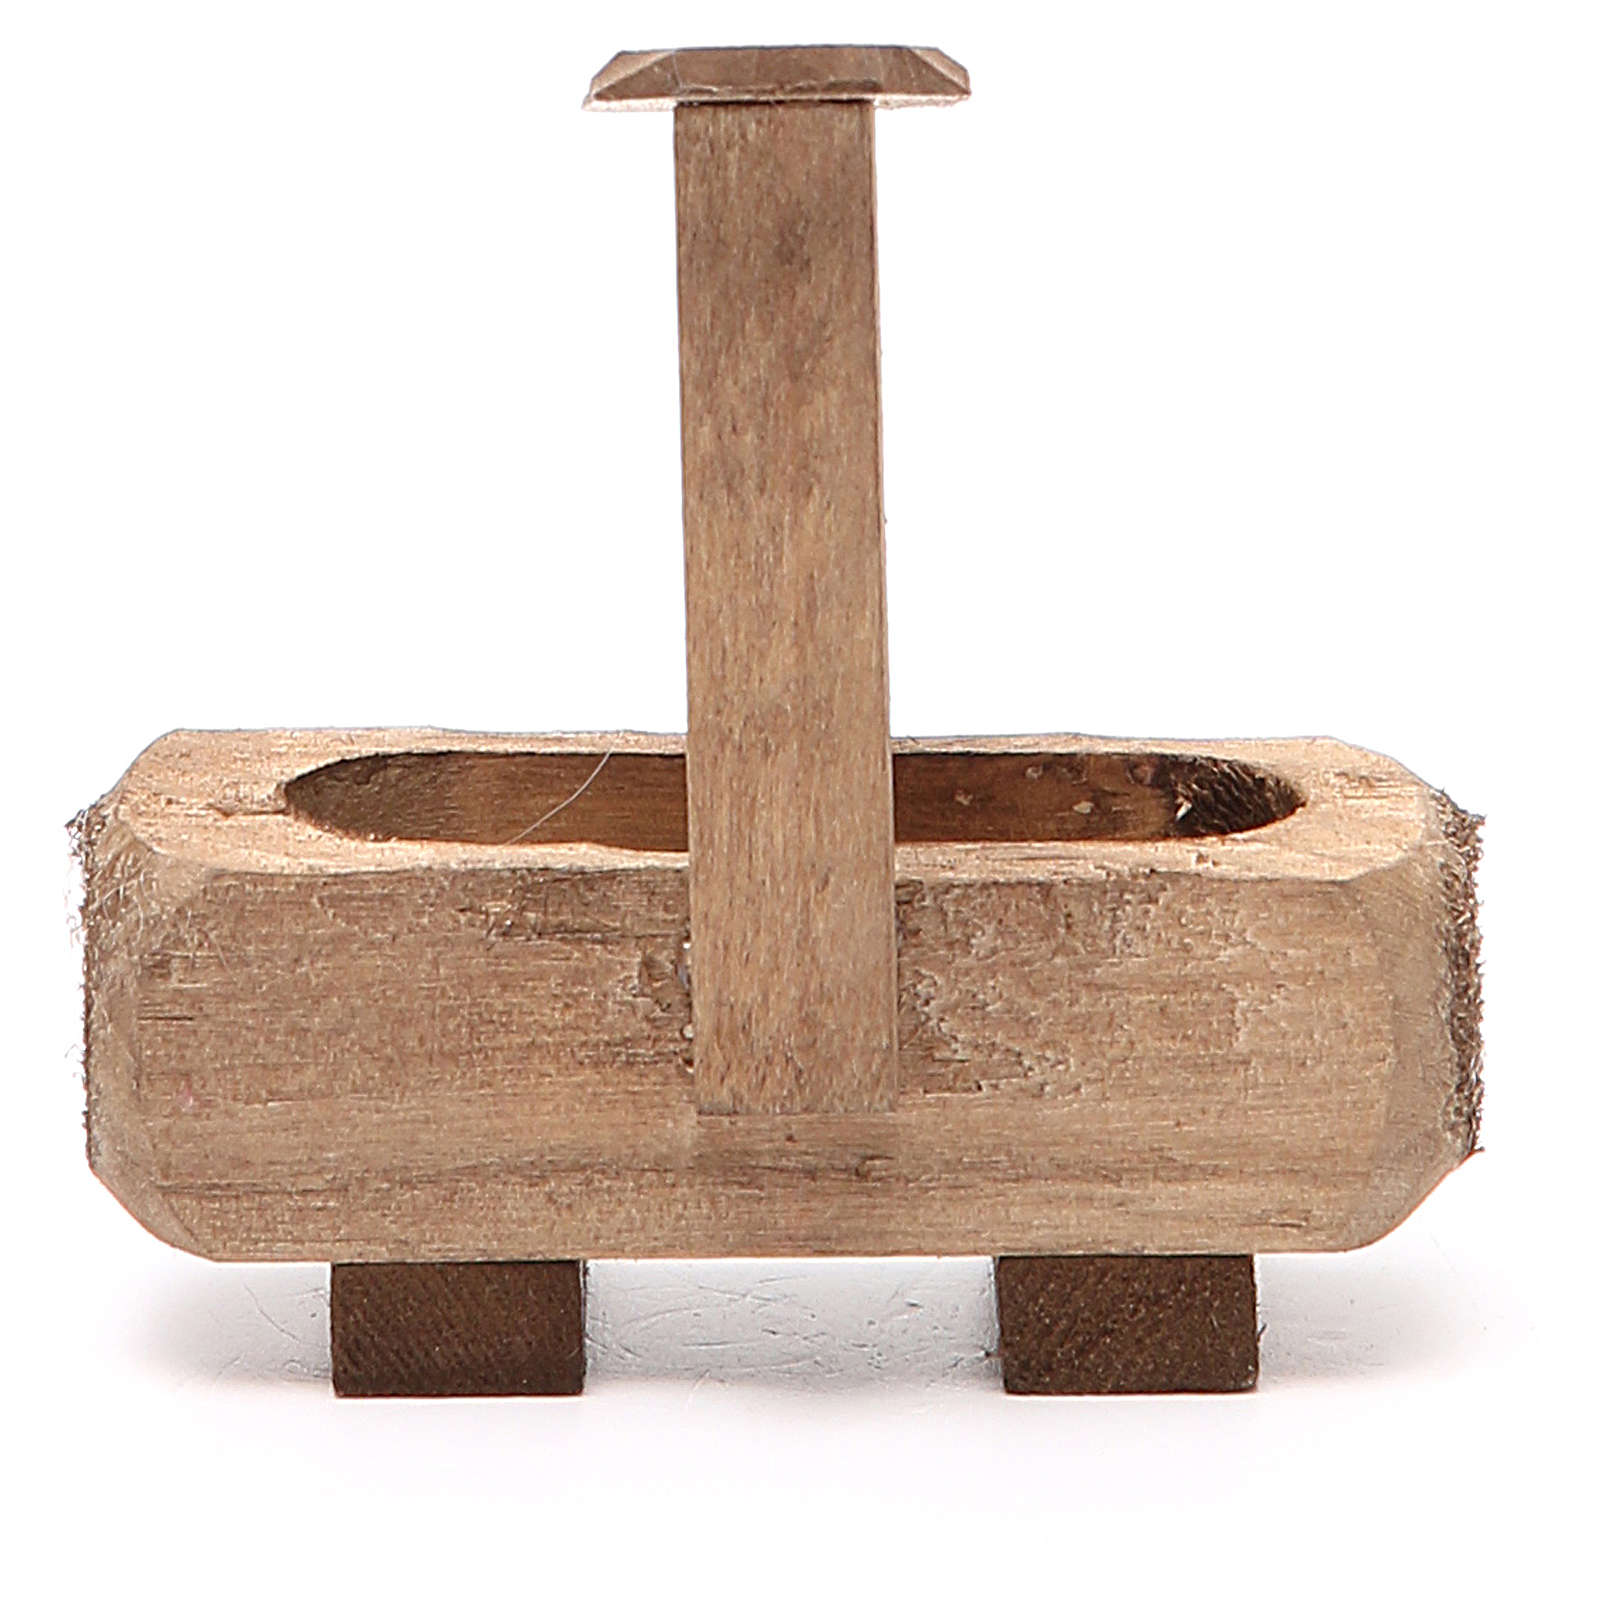 Fuente para belén madera oscura 8x5x8 cm 4